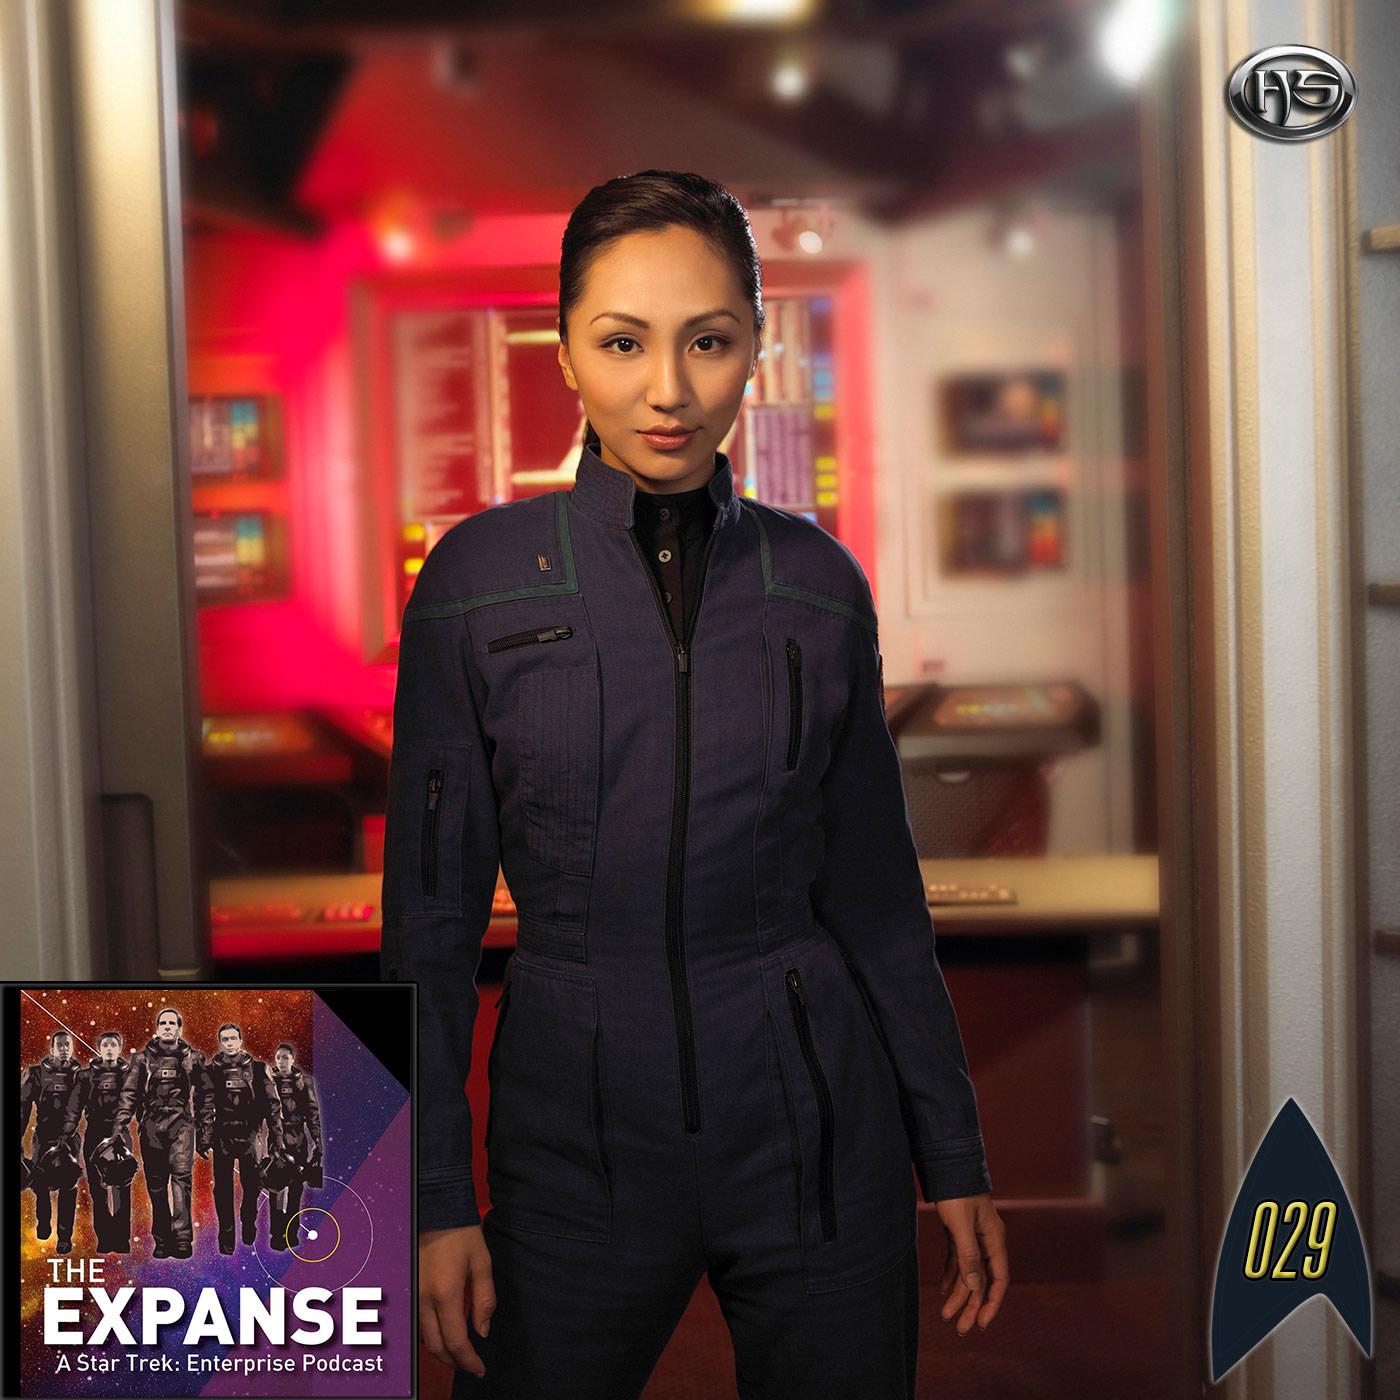 The Expanse Episode 29